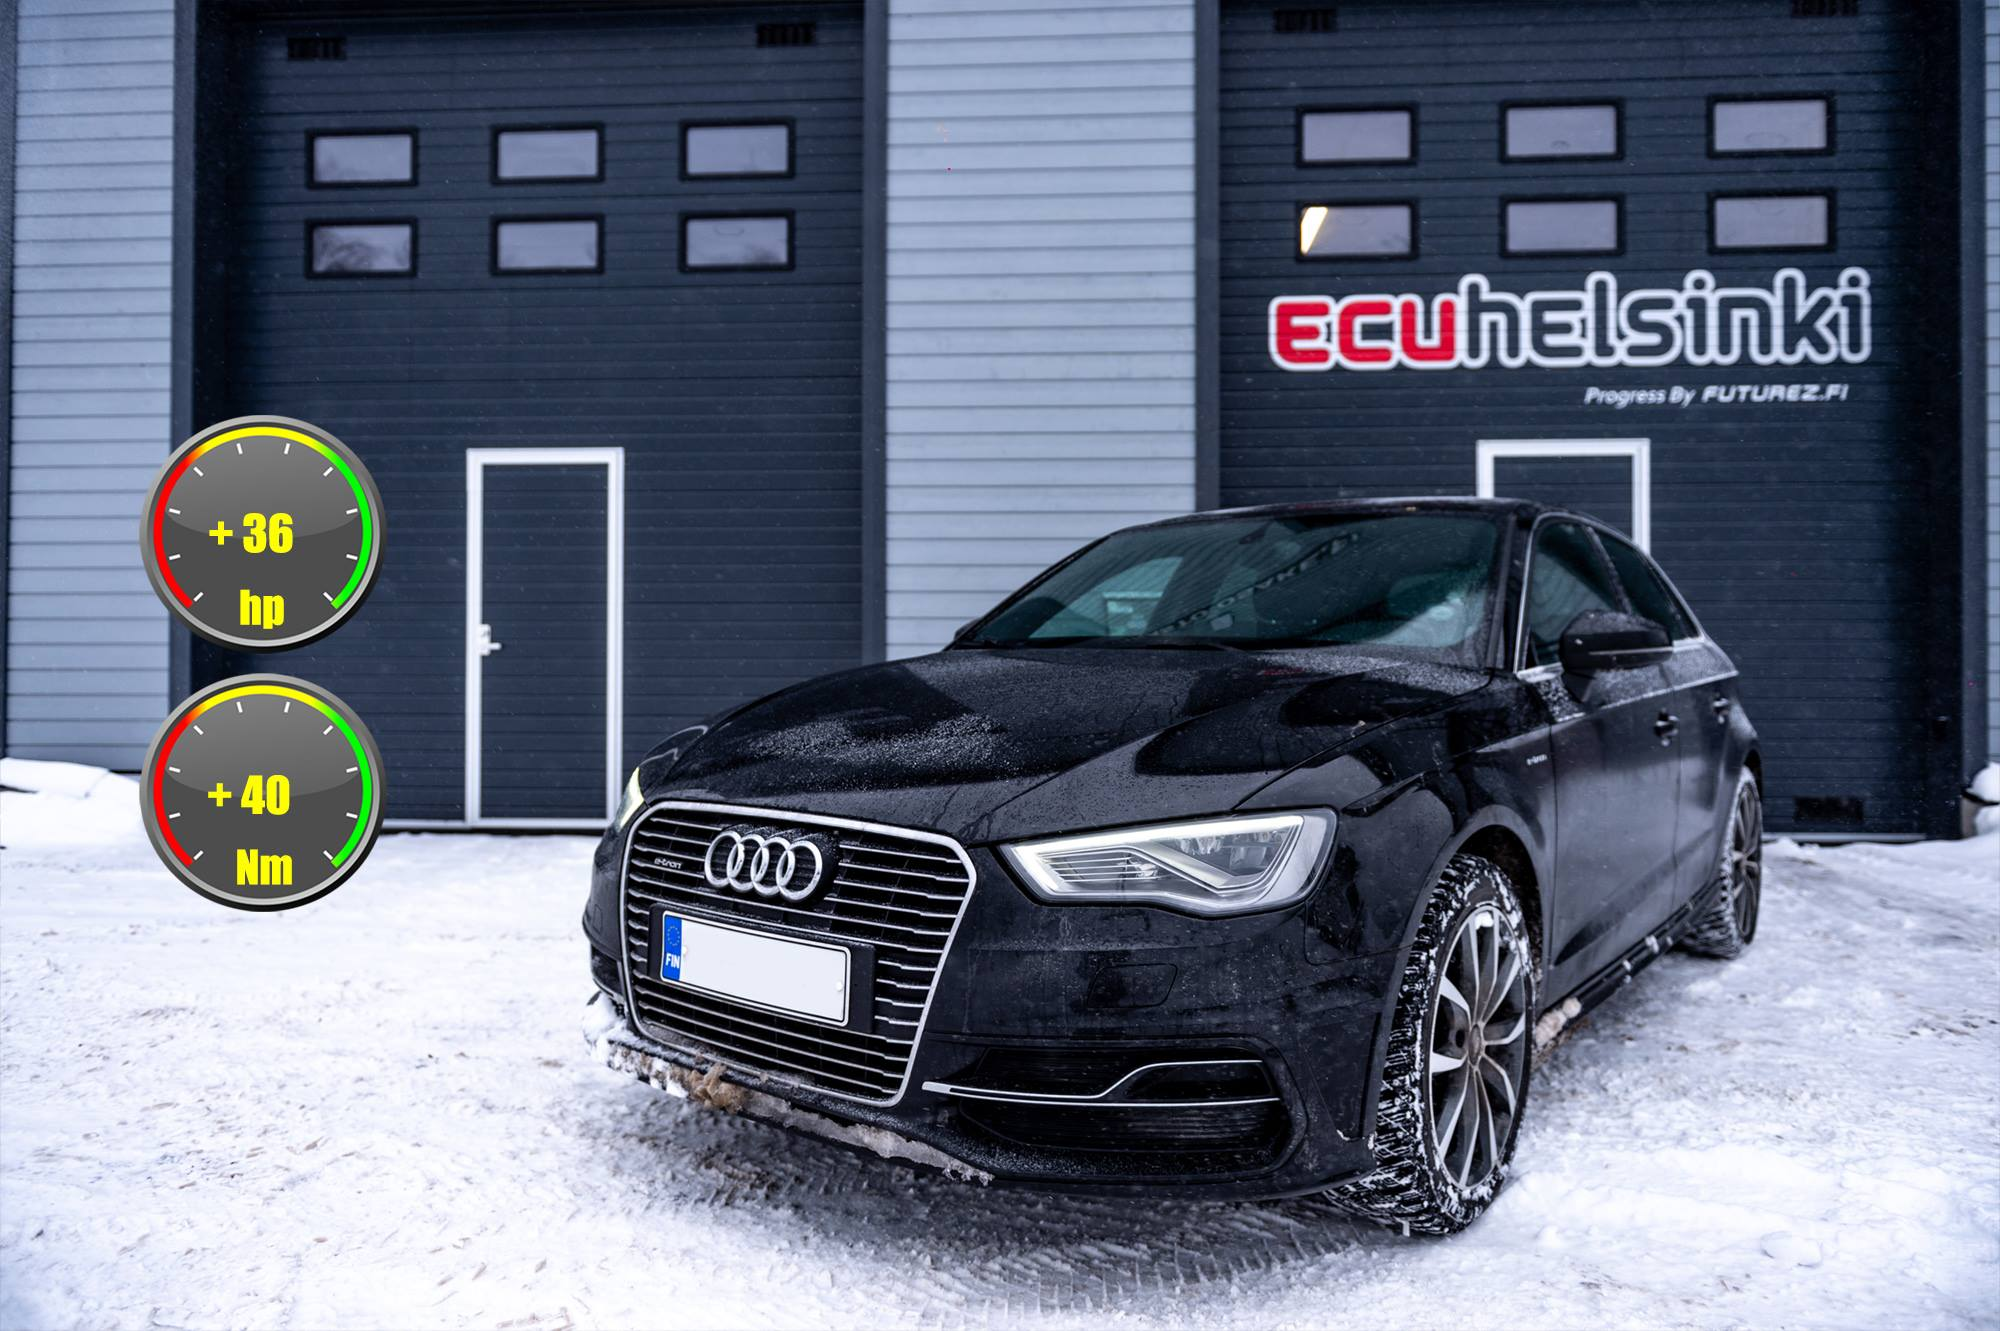 Audi e-tron lastutus celtic tuning